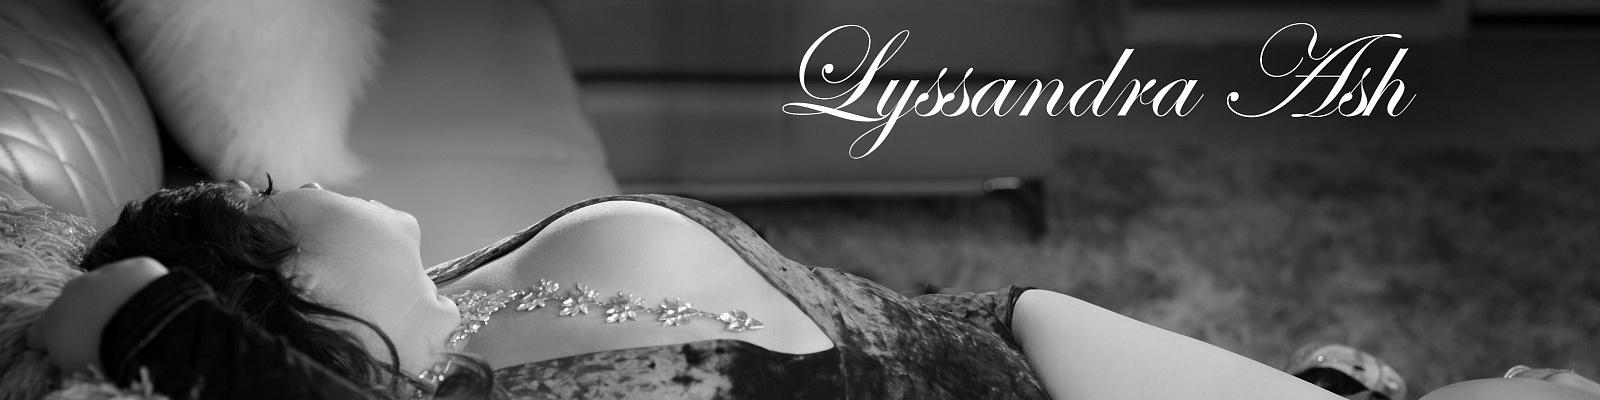 Lyssandra Ash's Cover Photo